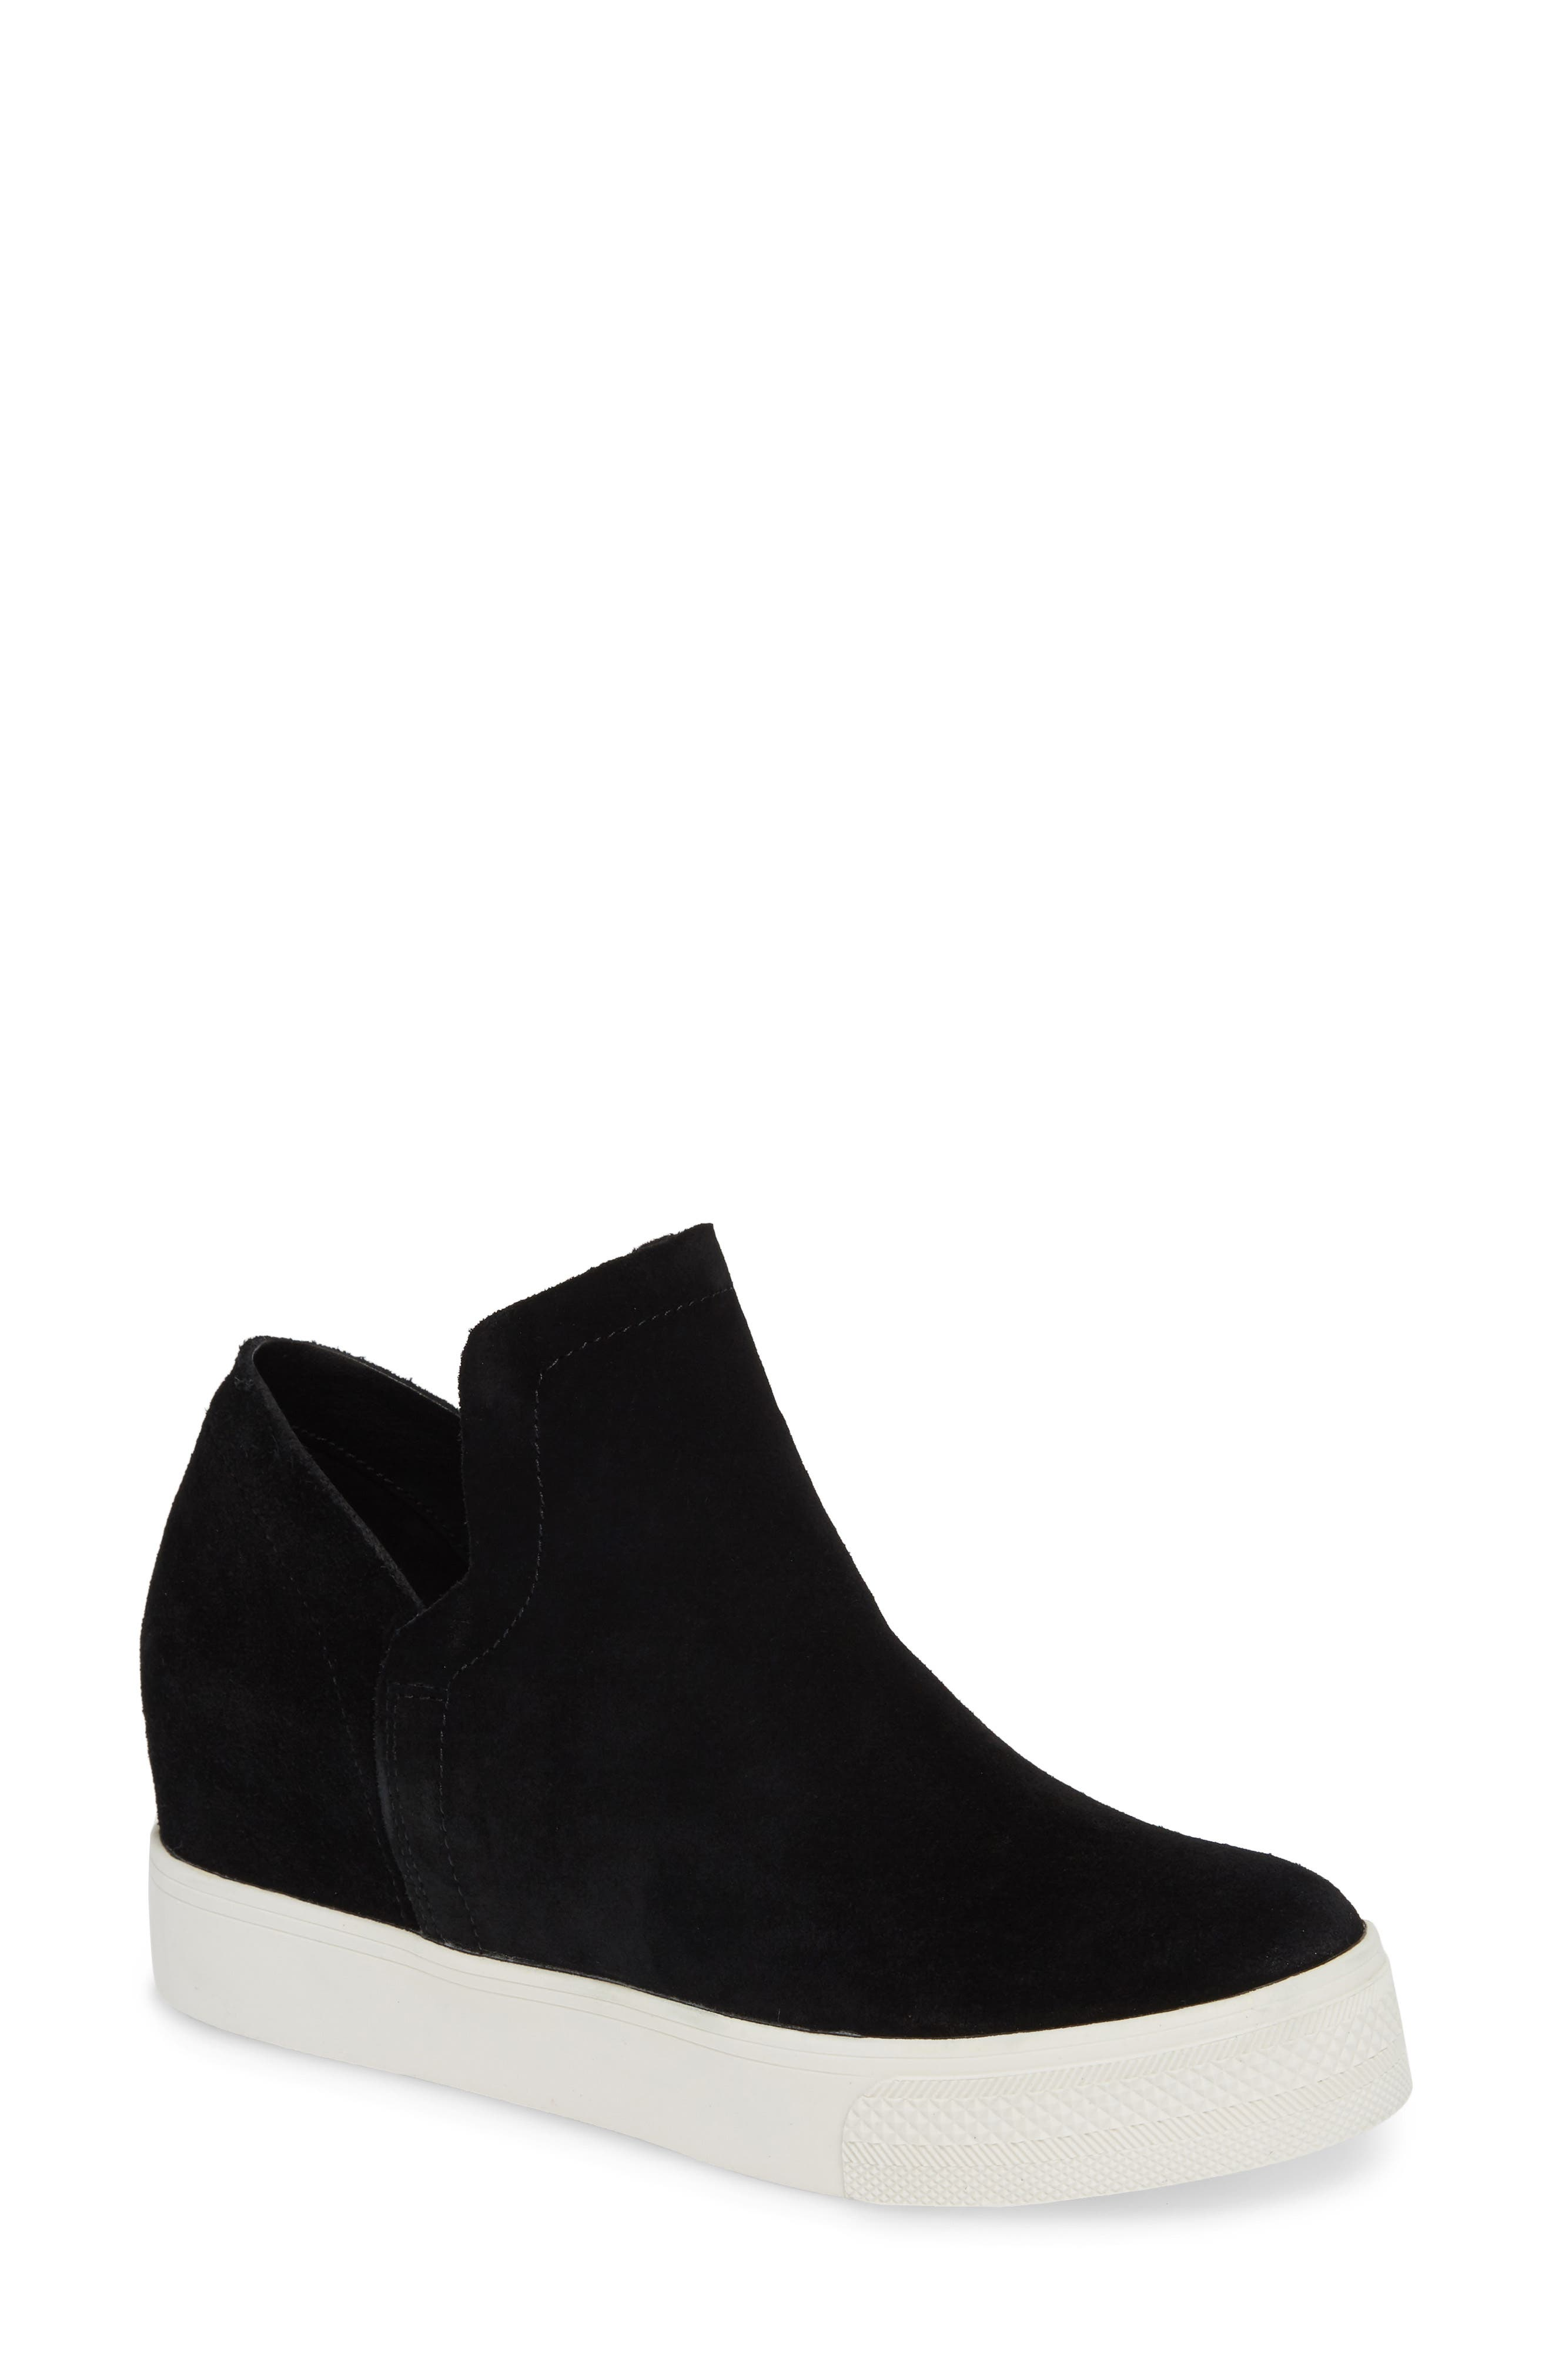 Wrangle Sneaker,                         Main,                         color, BLACK SUEDE